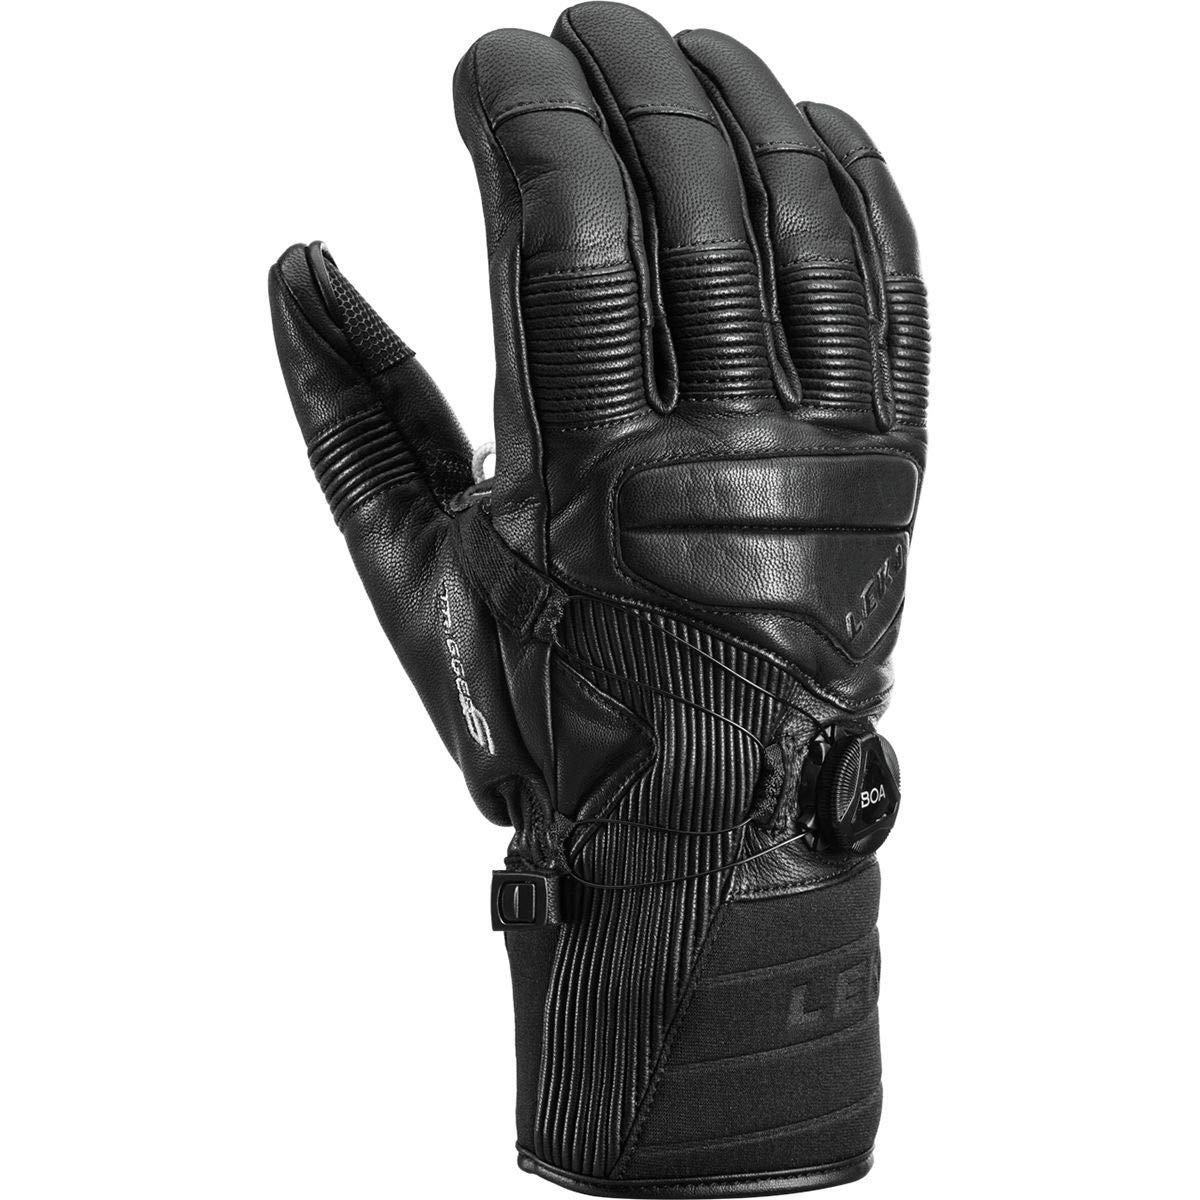 LEKI Progressive Tune Leather Boa MF Touch Glove - Men's